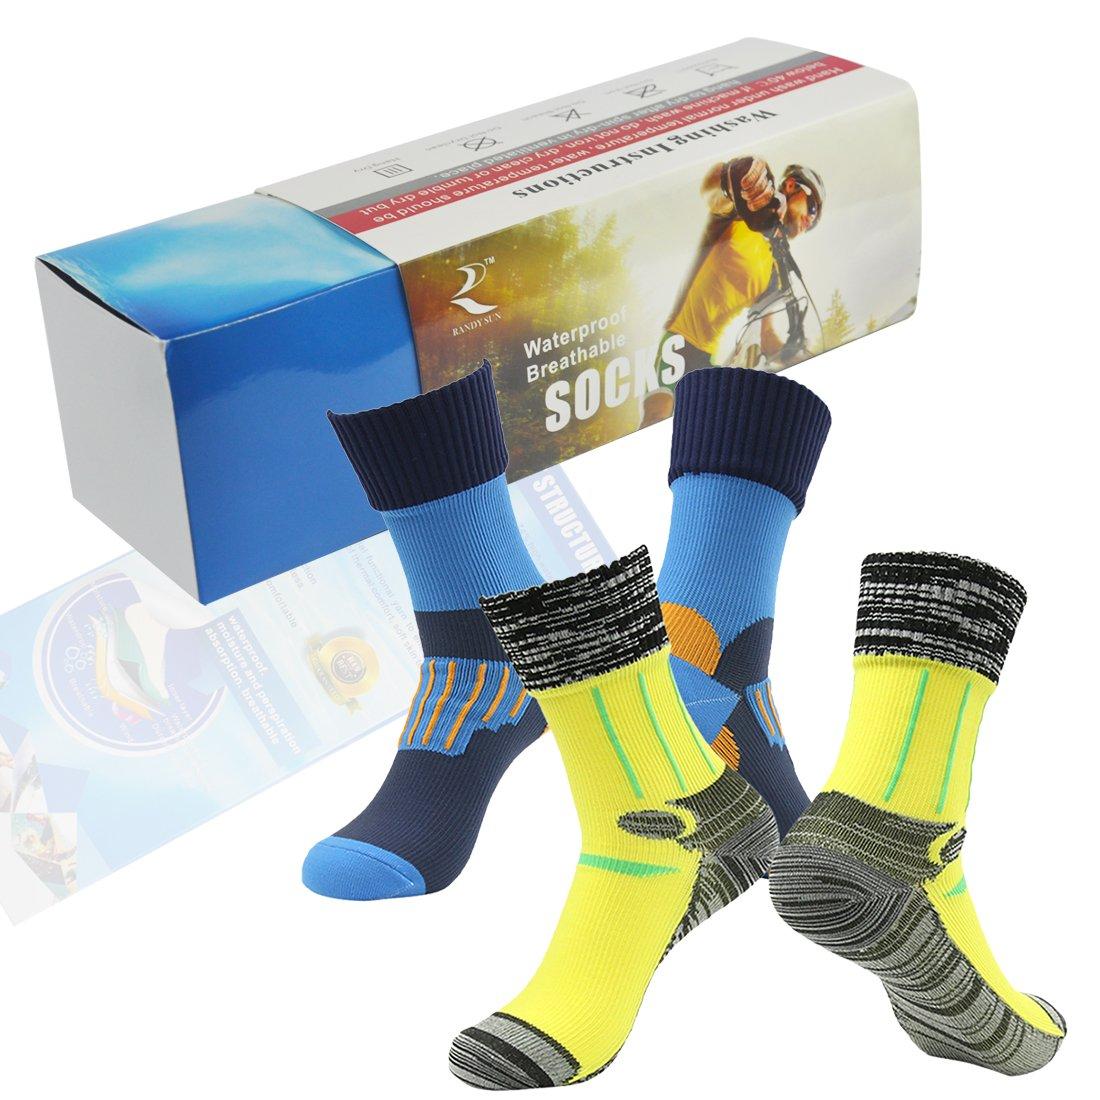 100% Waterproof Breathable Socks SGS Certified RANDY SUN Unisex Sport Climbing Skiing Trekking Hiking Socks